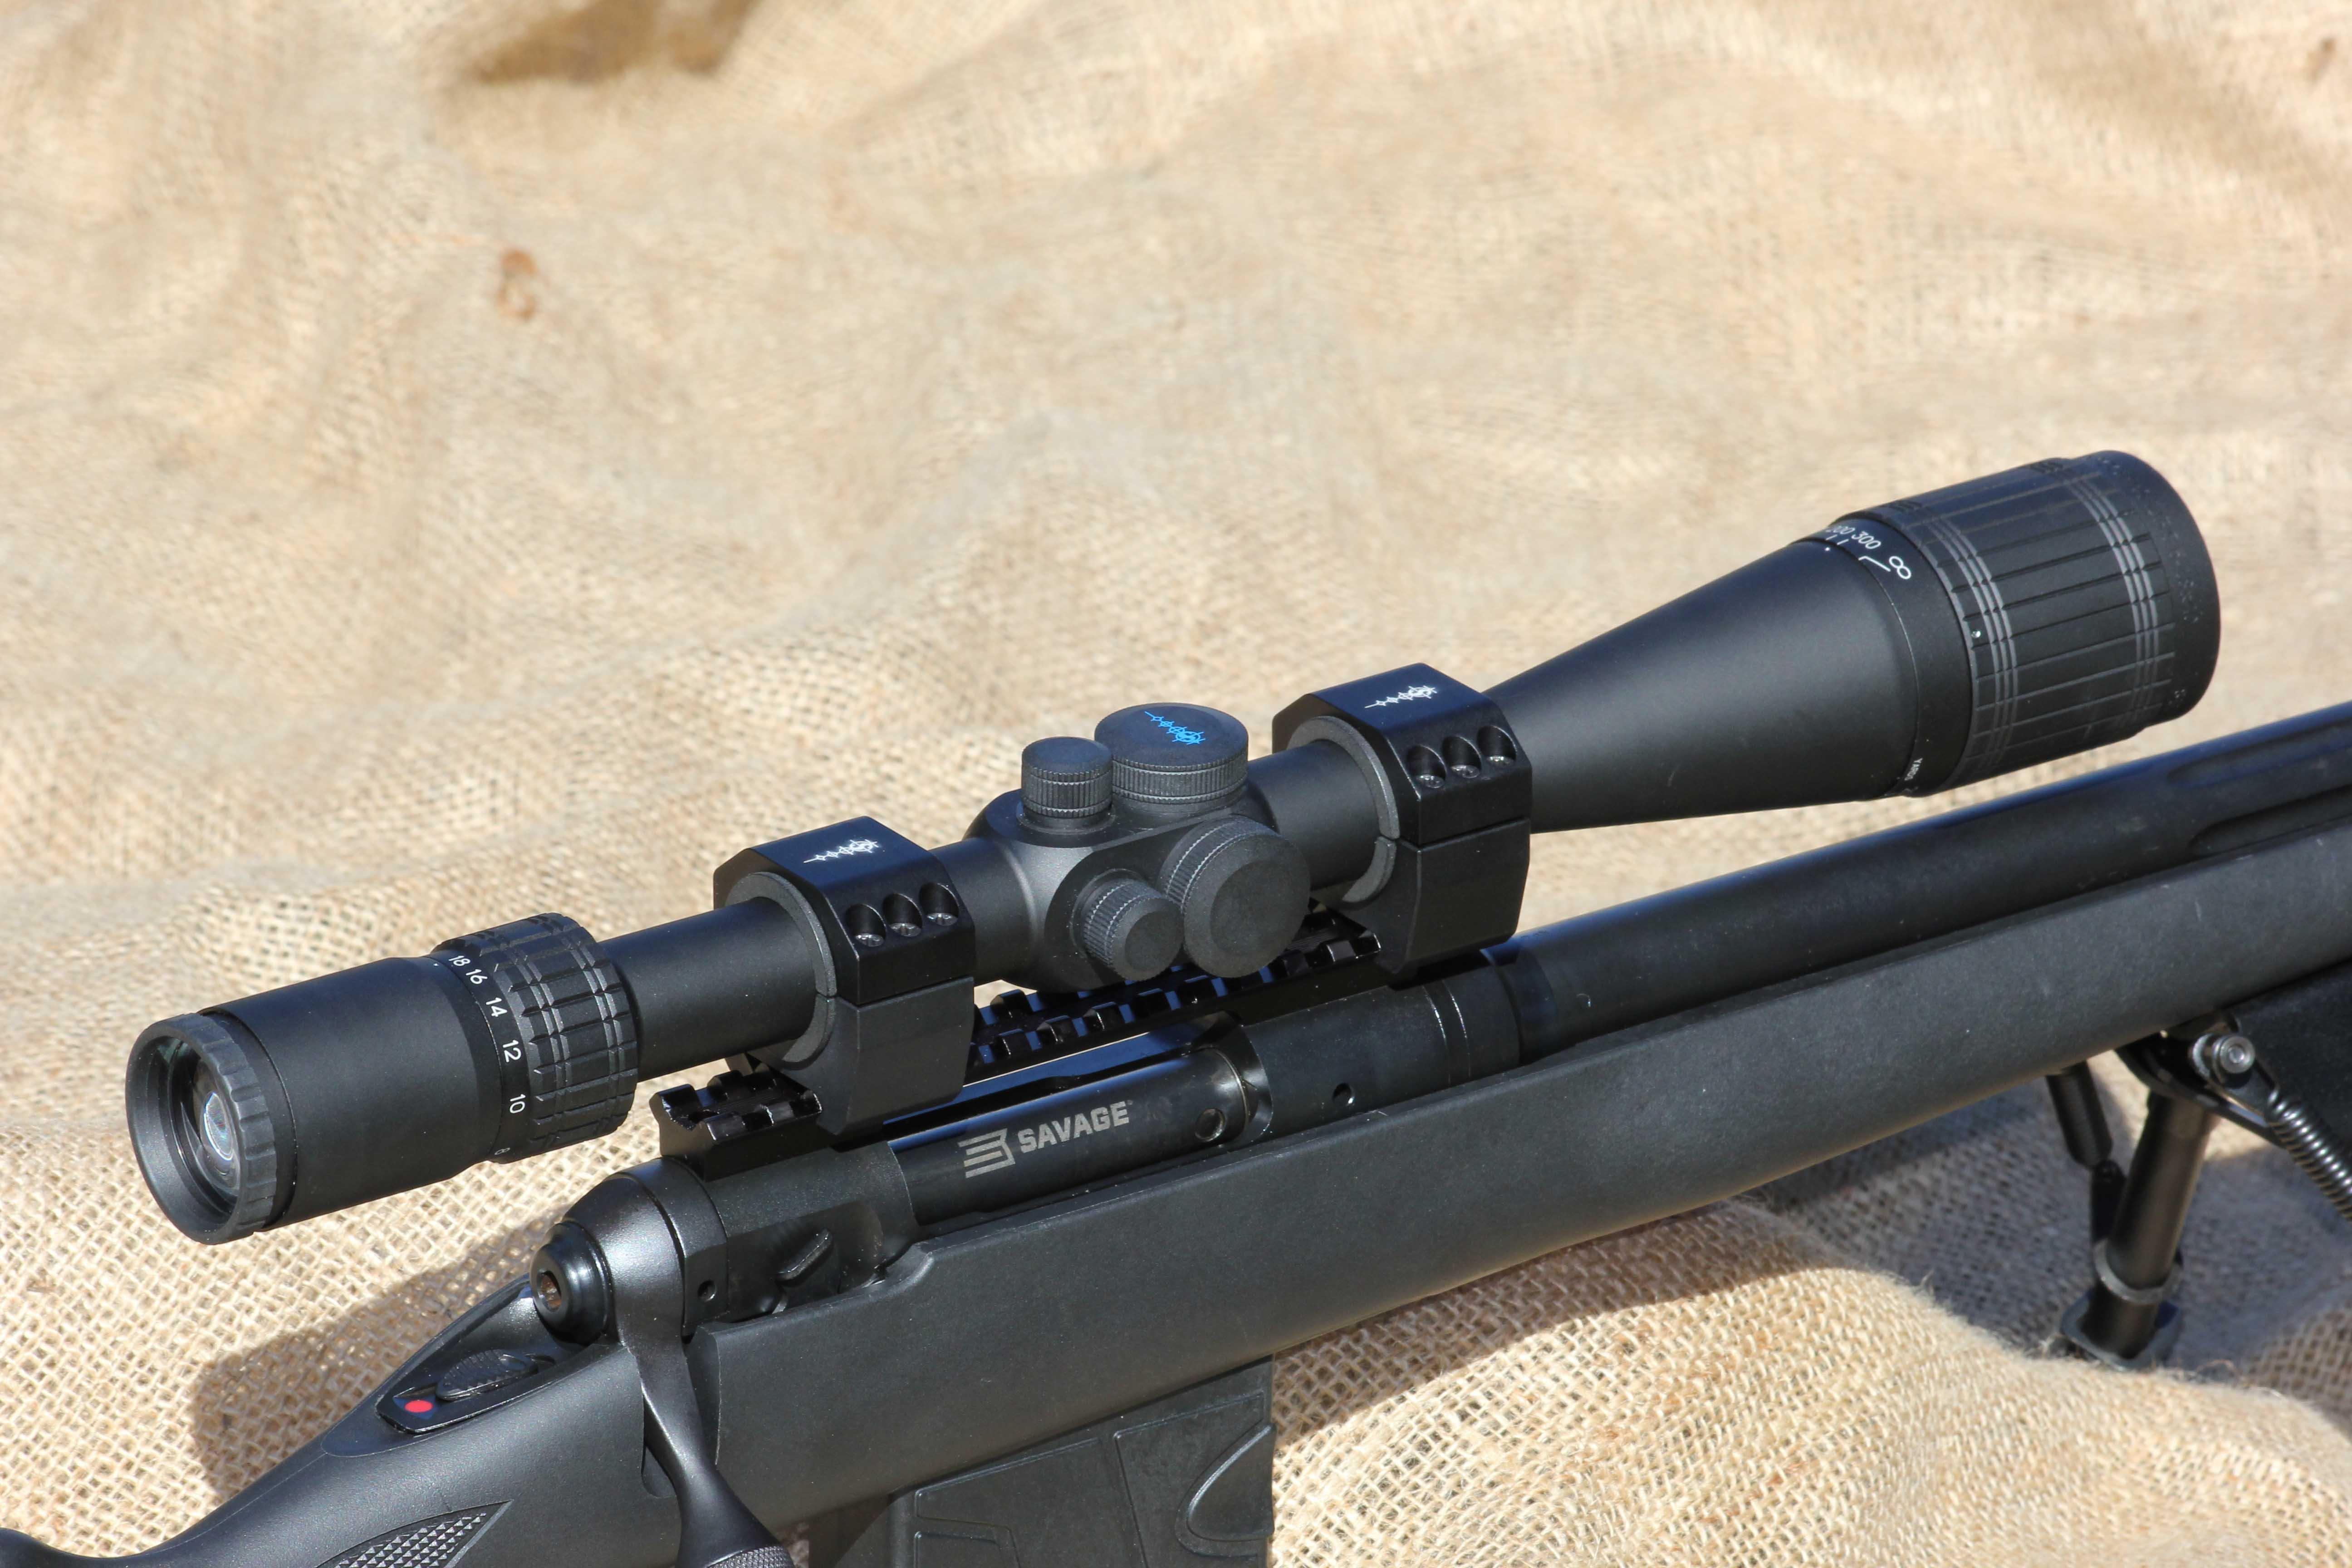 Shepherd Scopes 30mm Double Lug Rings